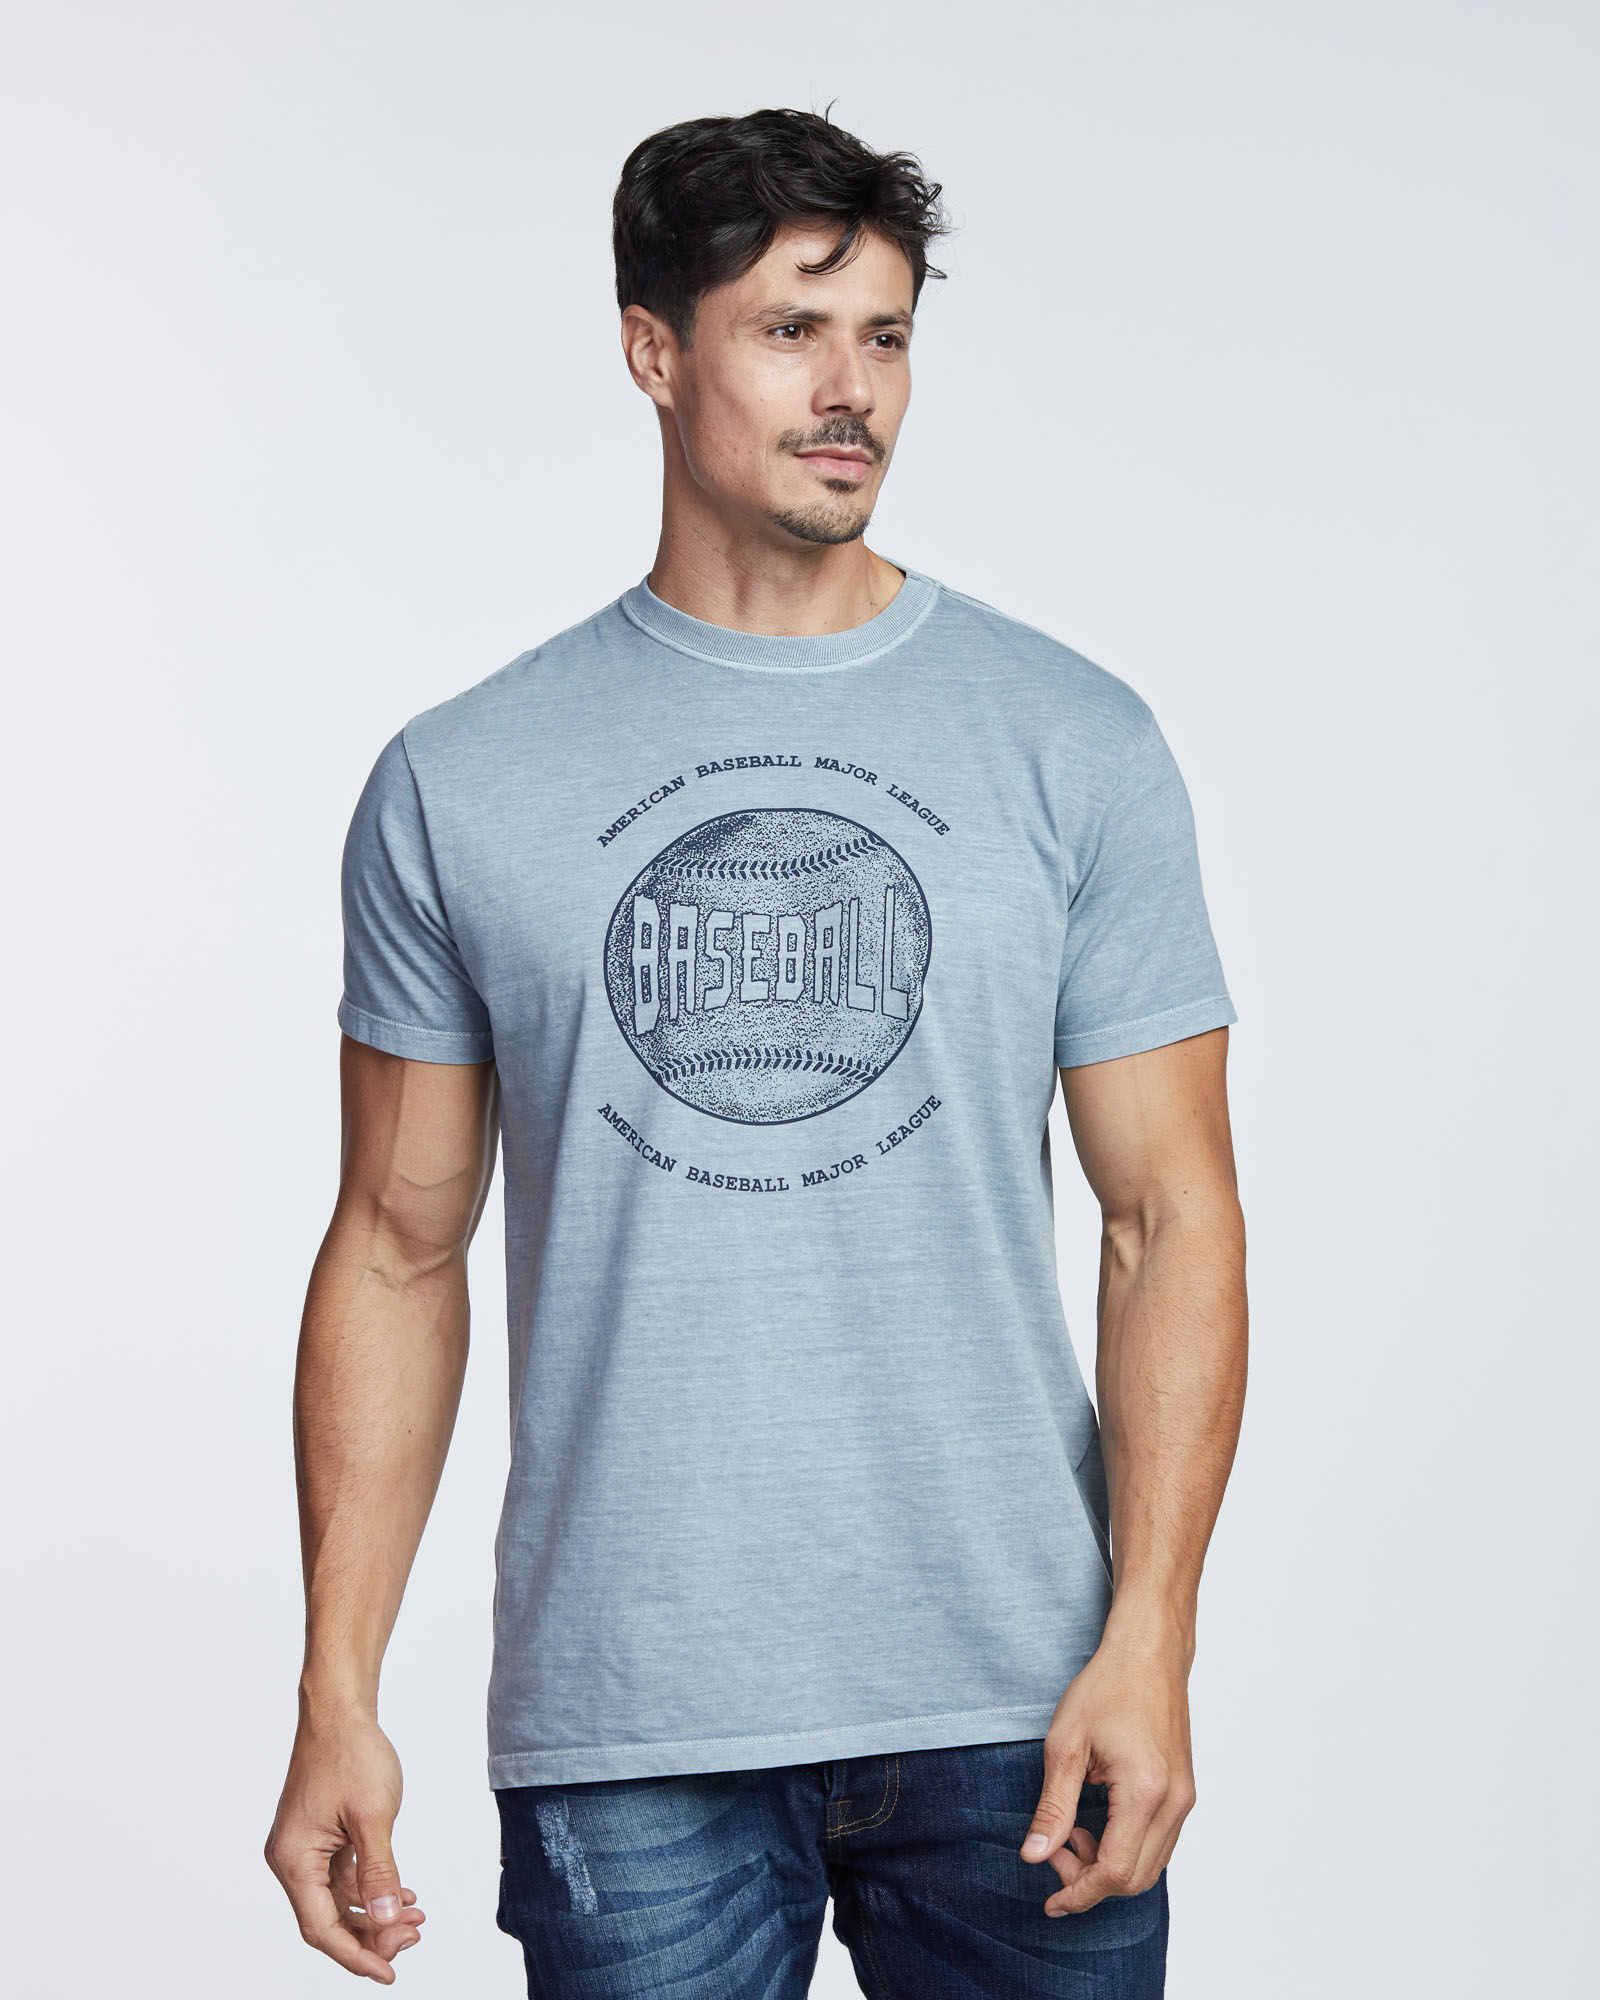 Camiseta Baseball Masculina Evolvee